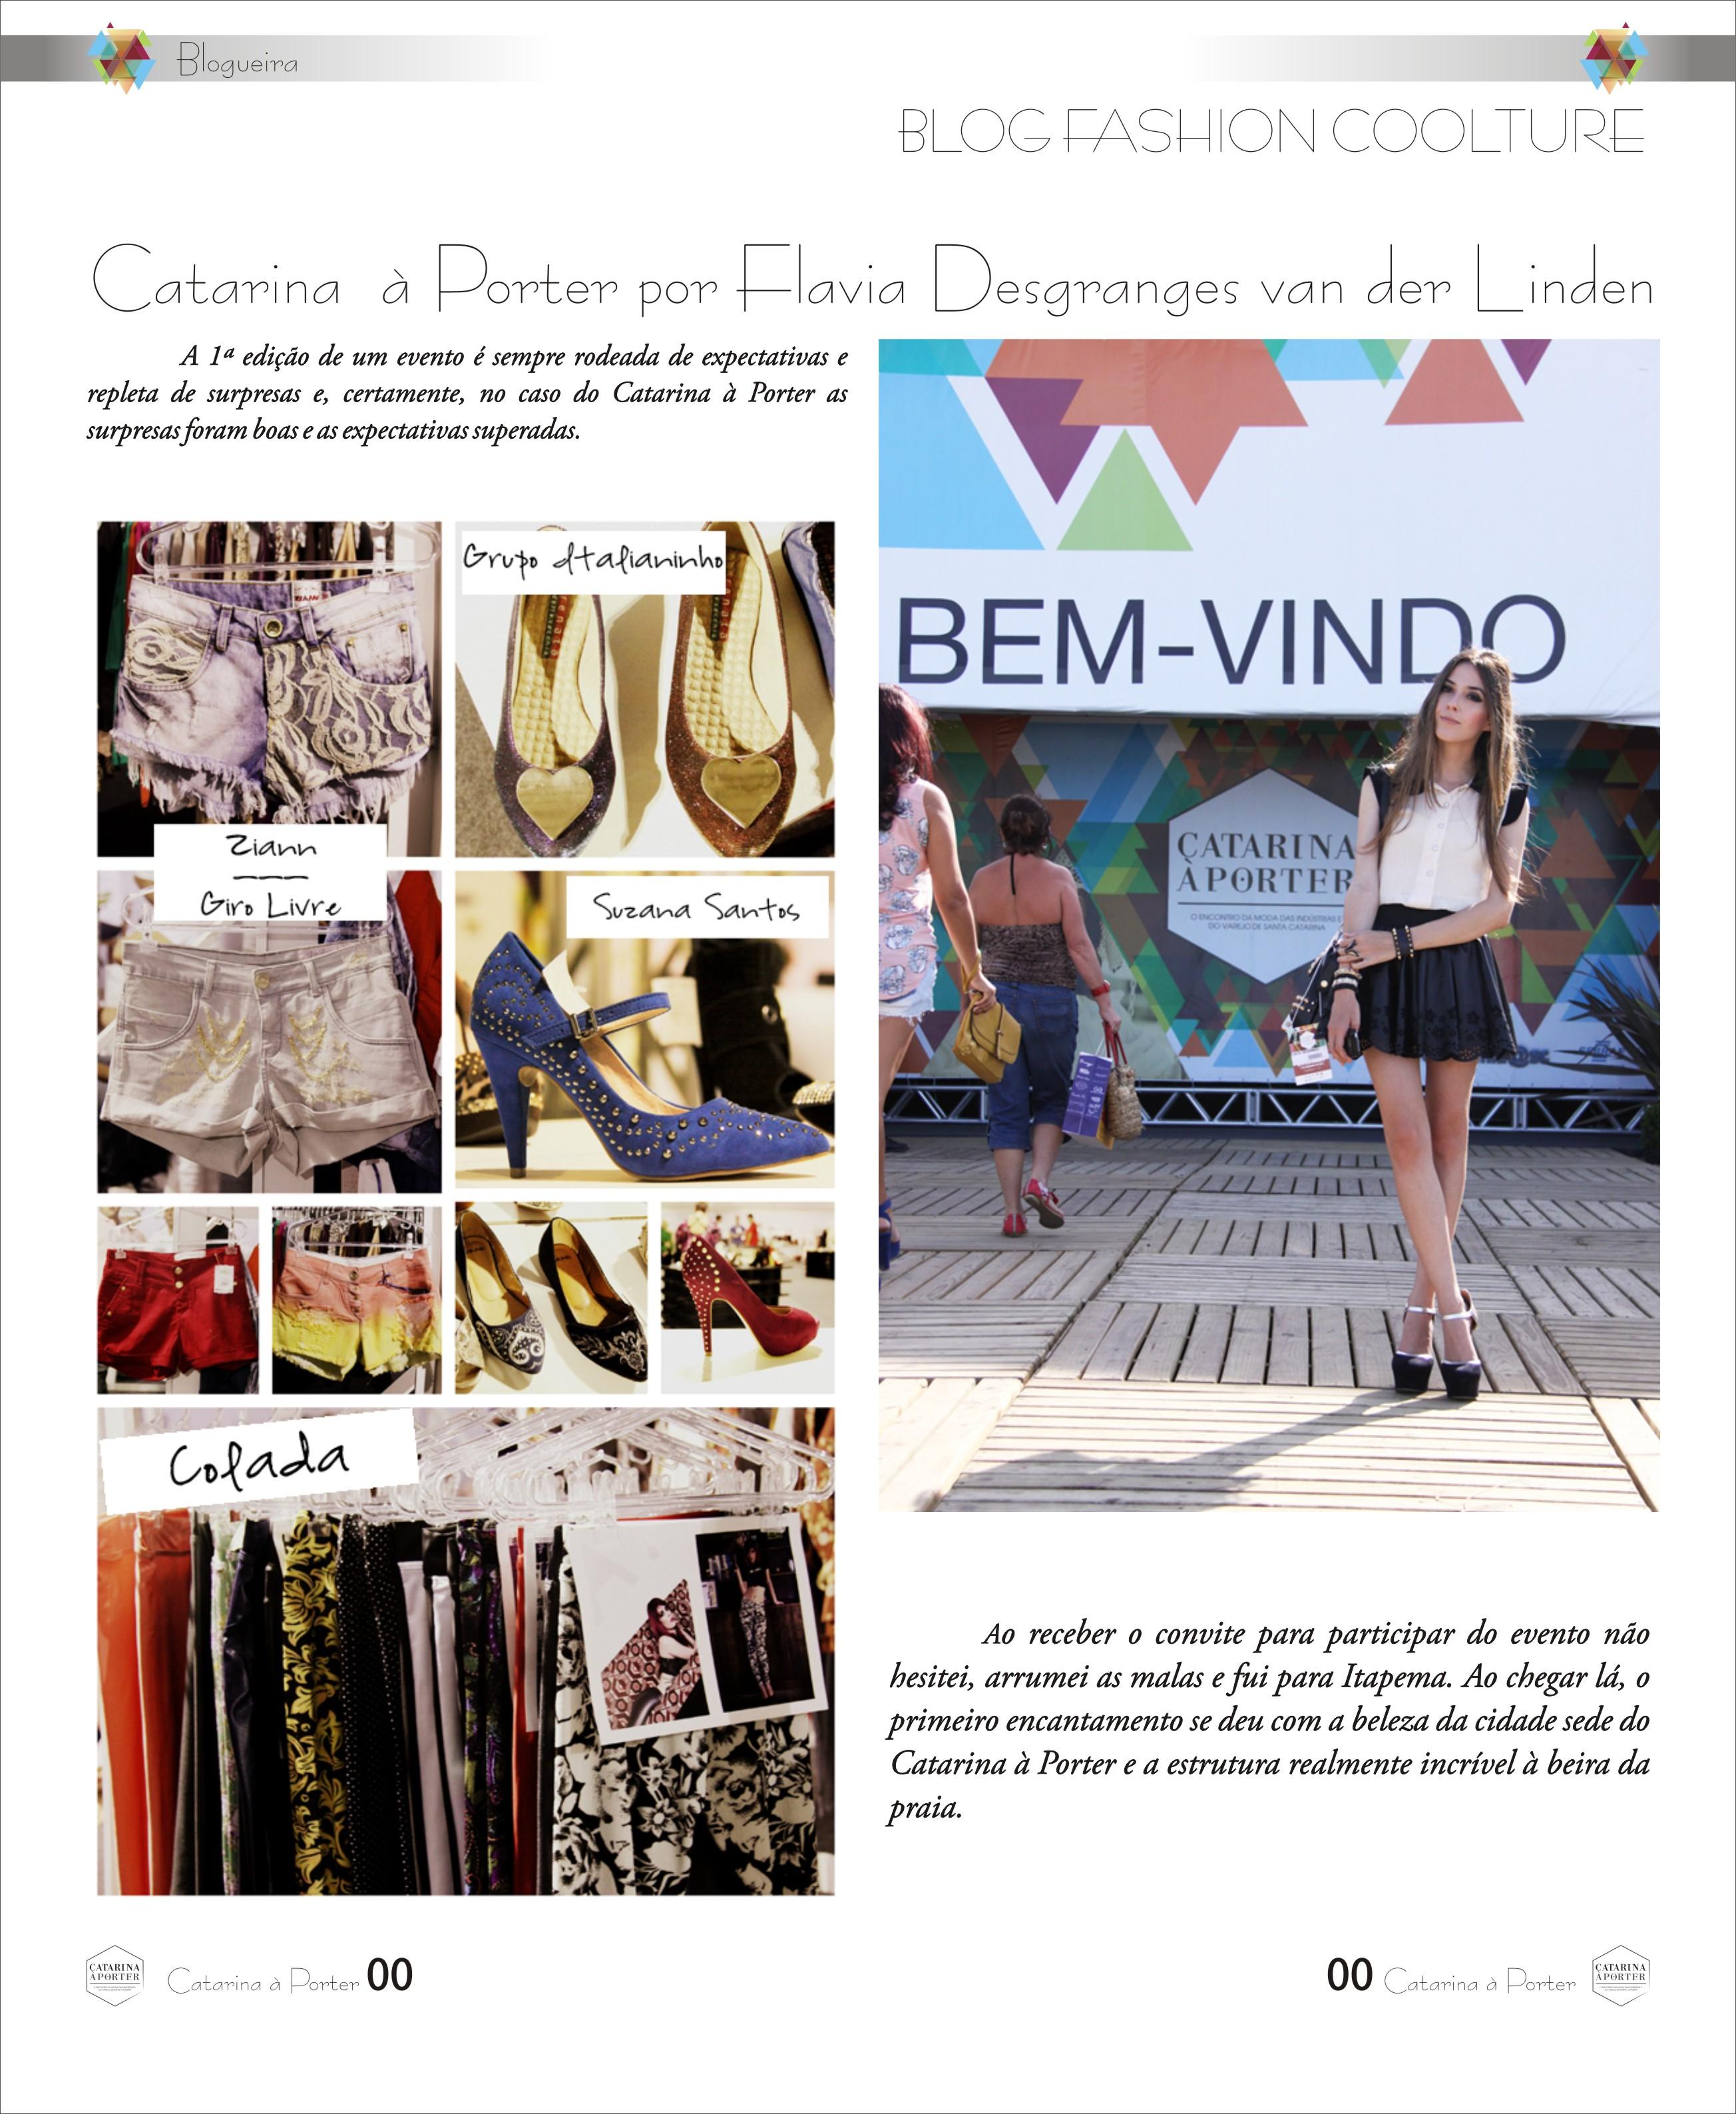 FashionCoolture - Catarina a Porter (4)